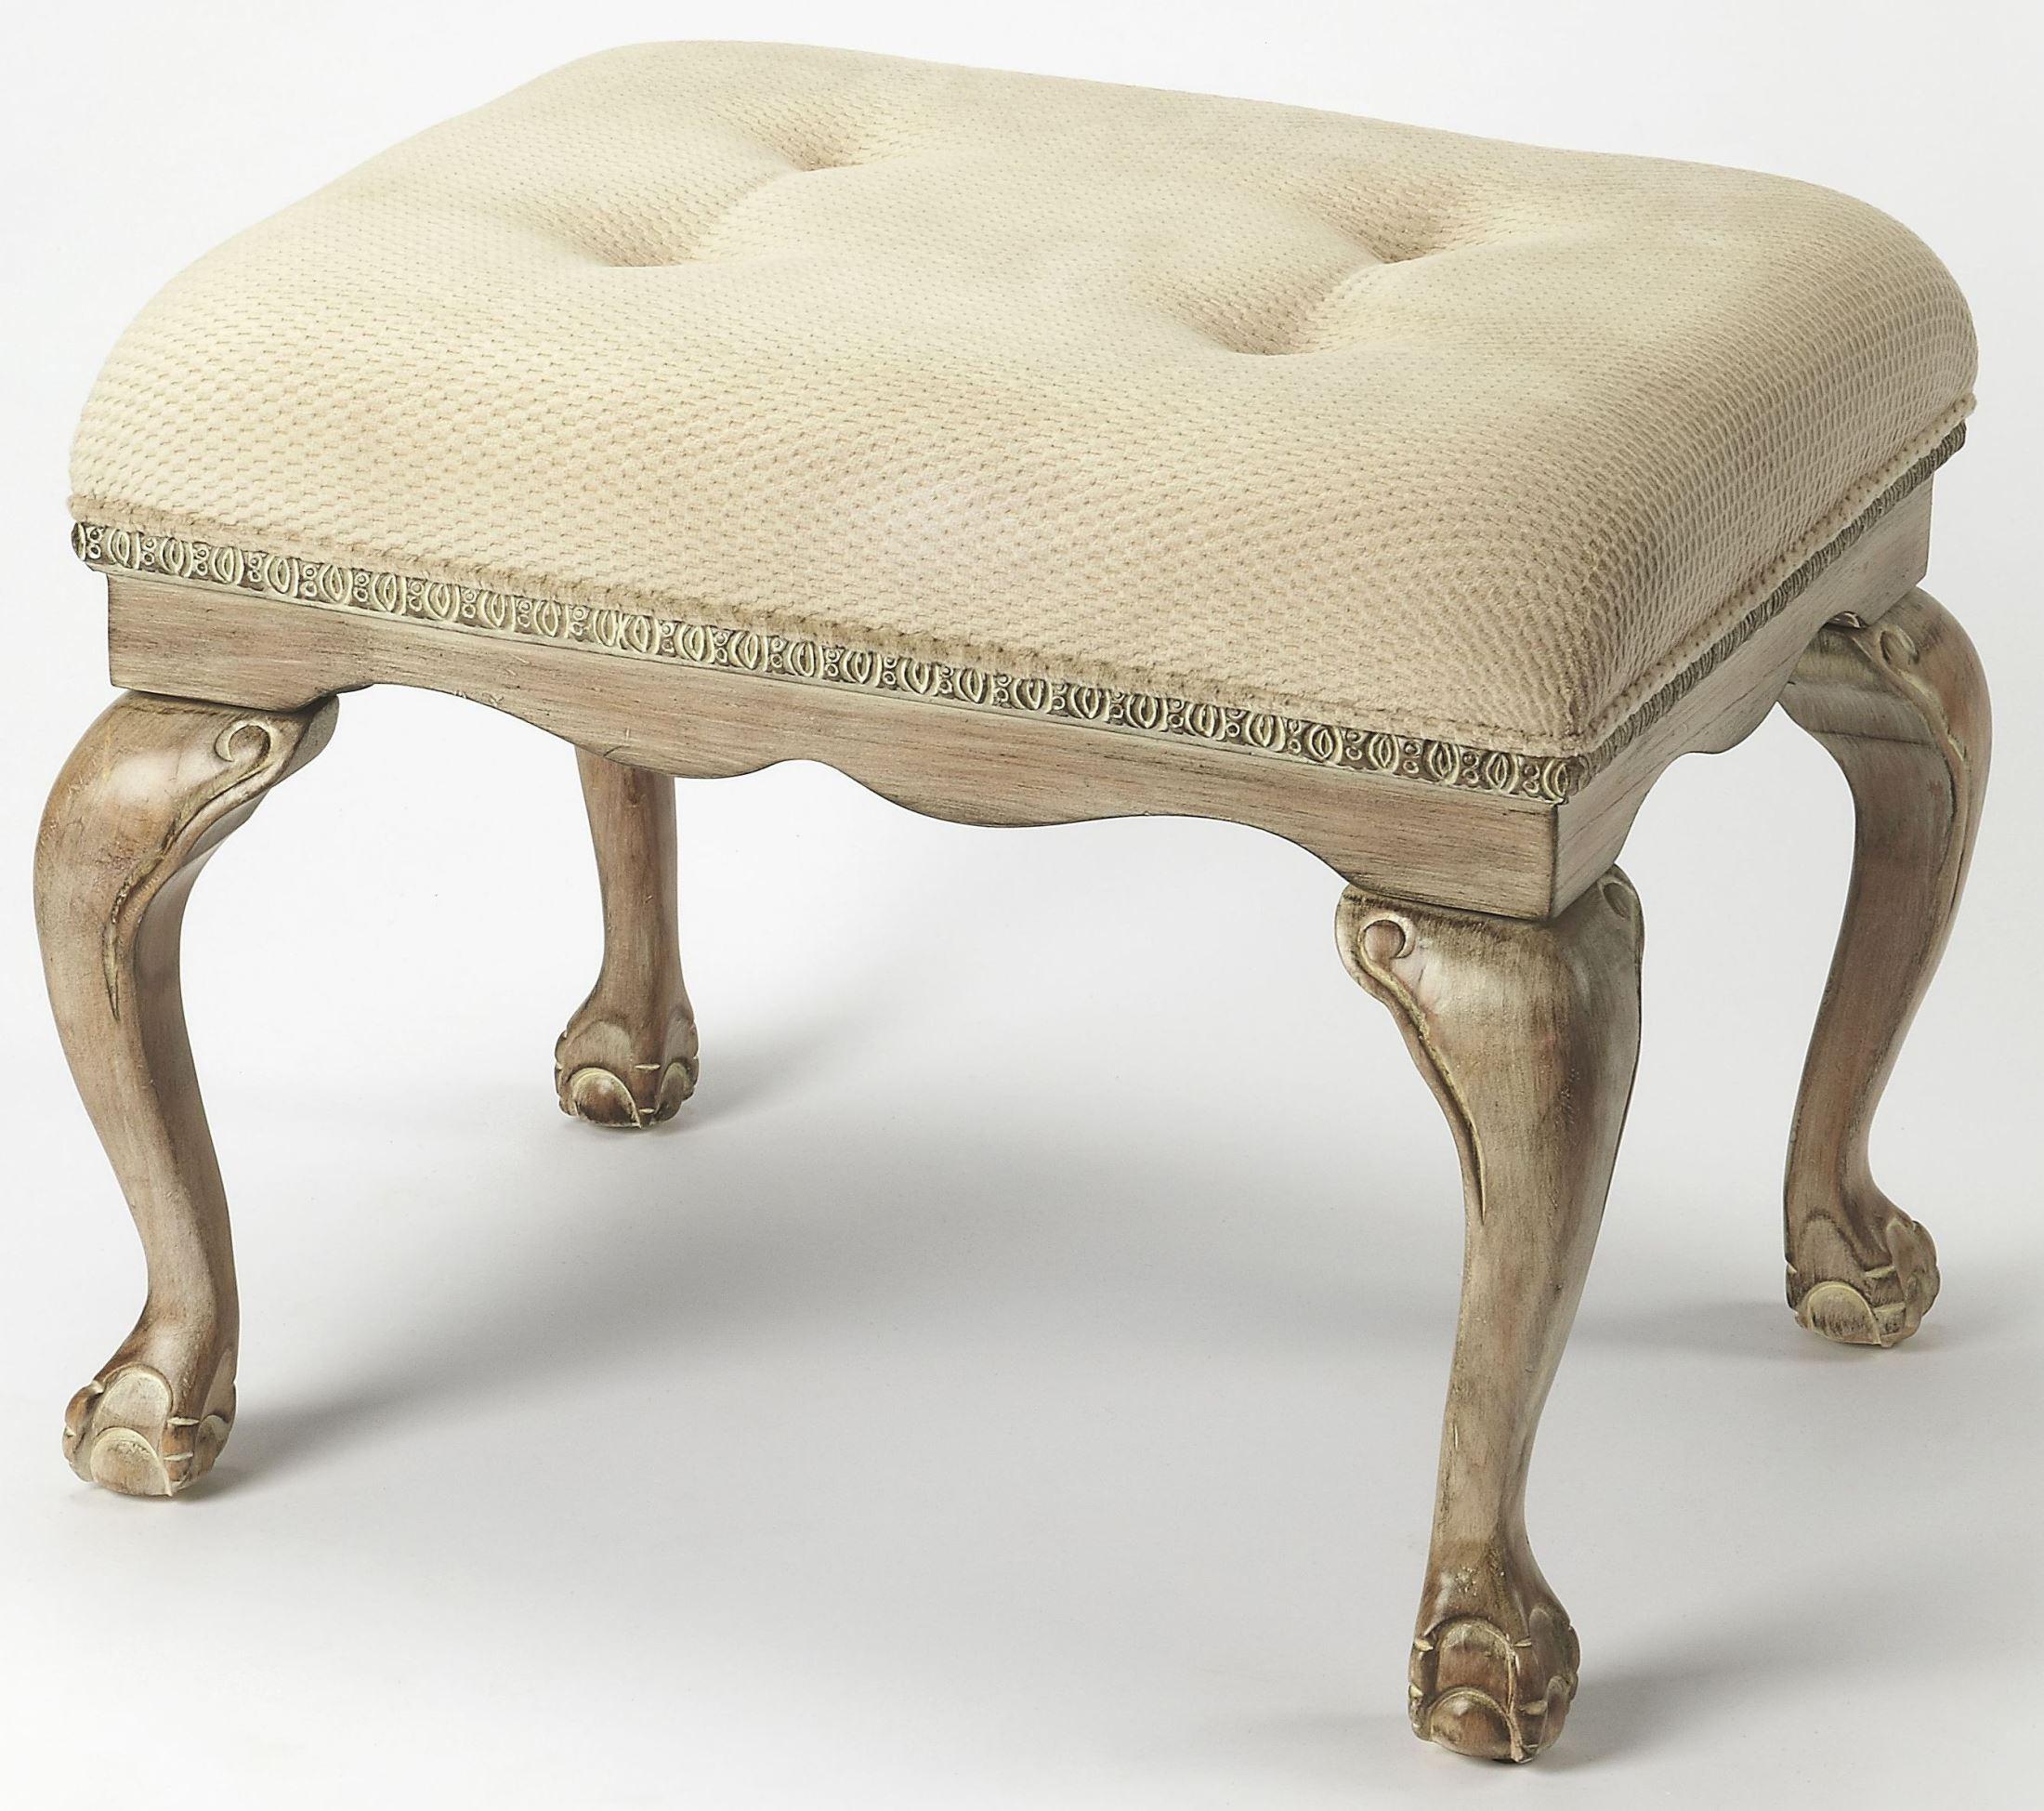 Ashford Driftwood Bench From Butler Coleman Furniture